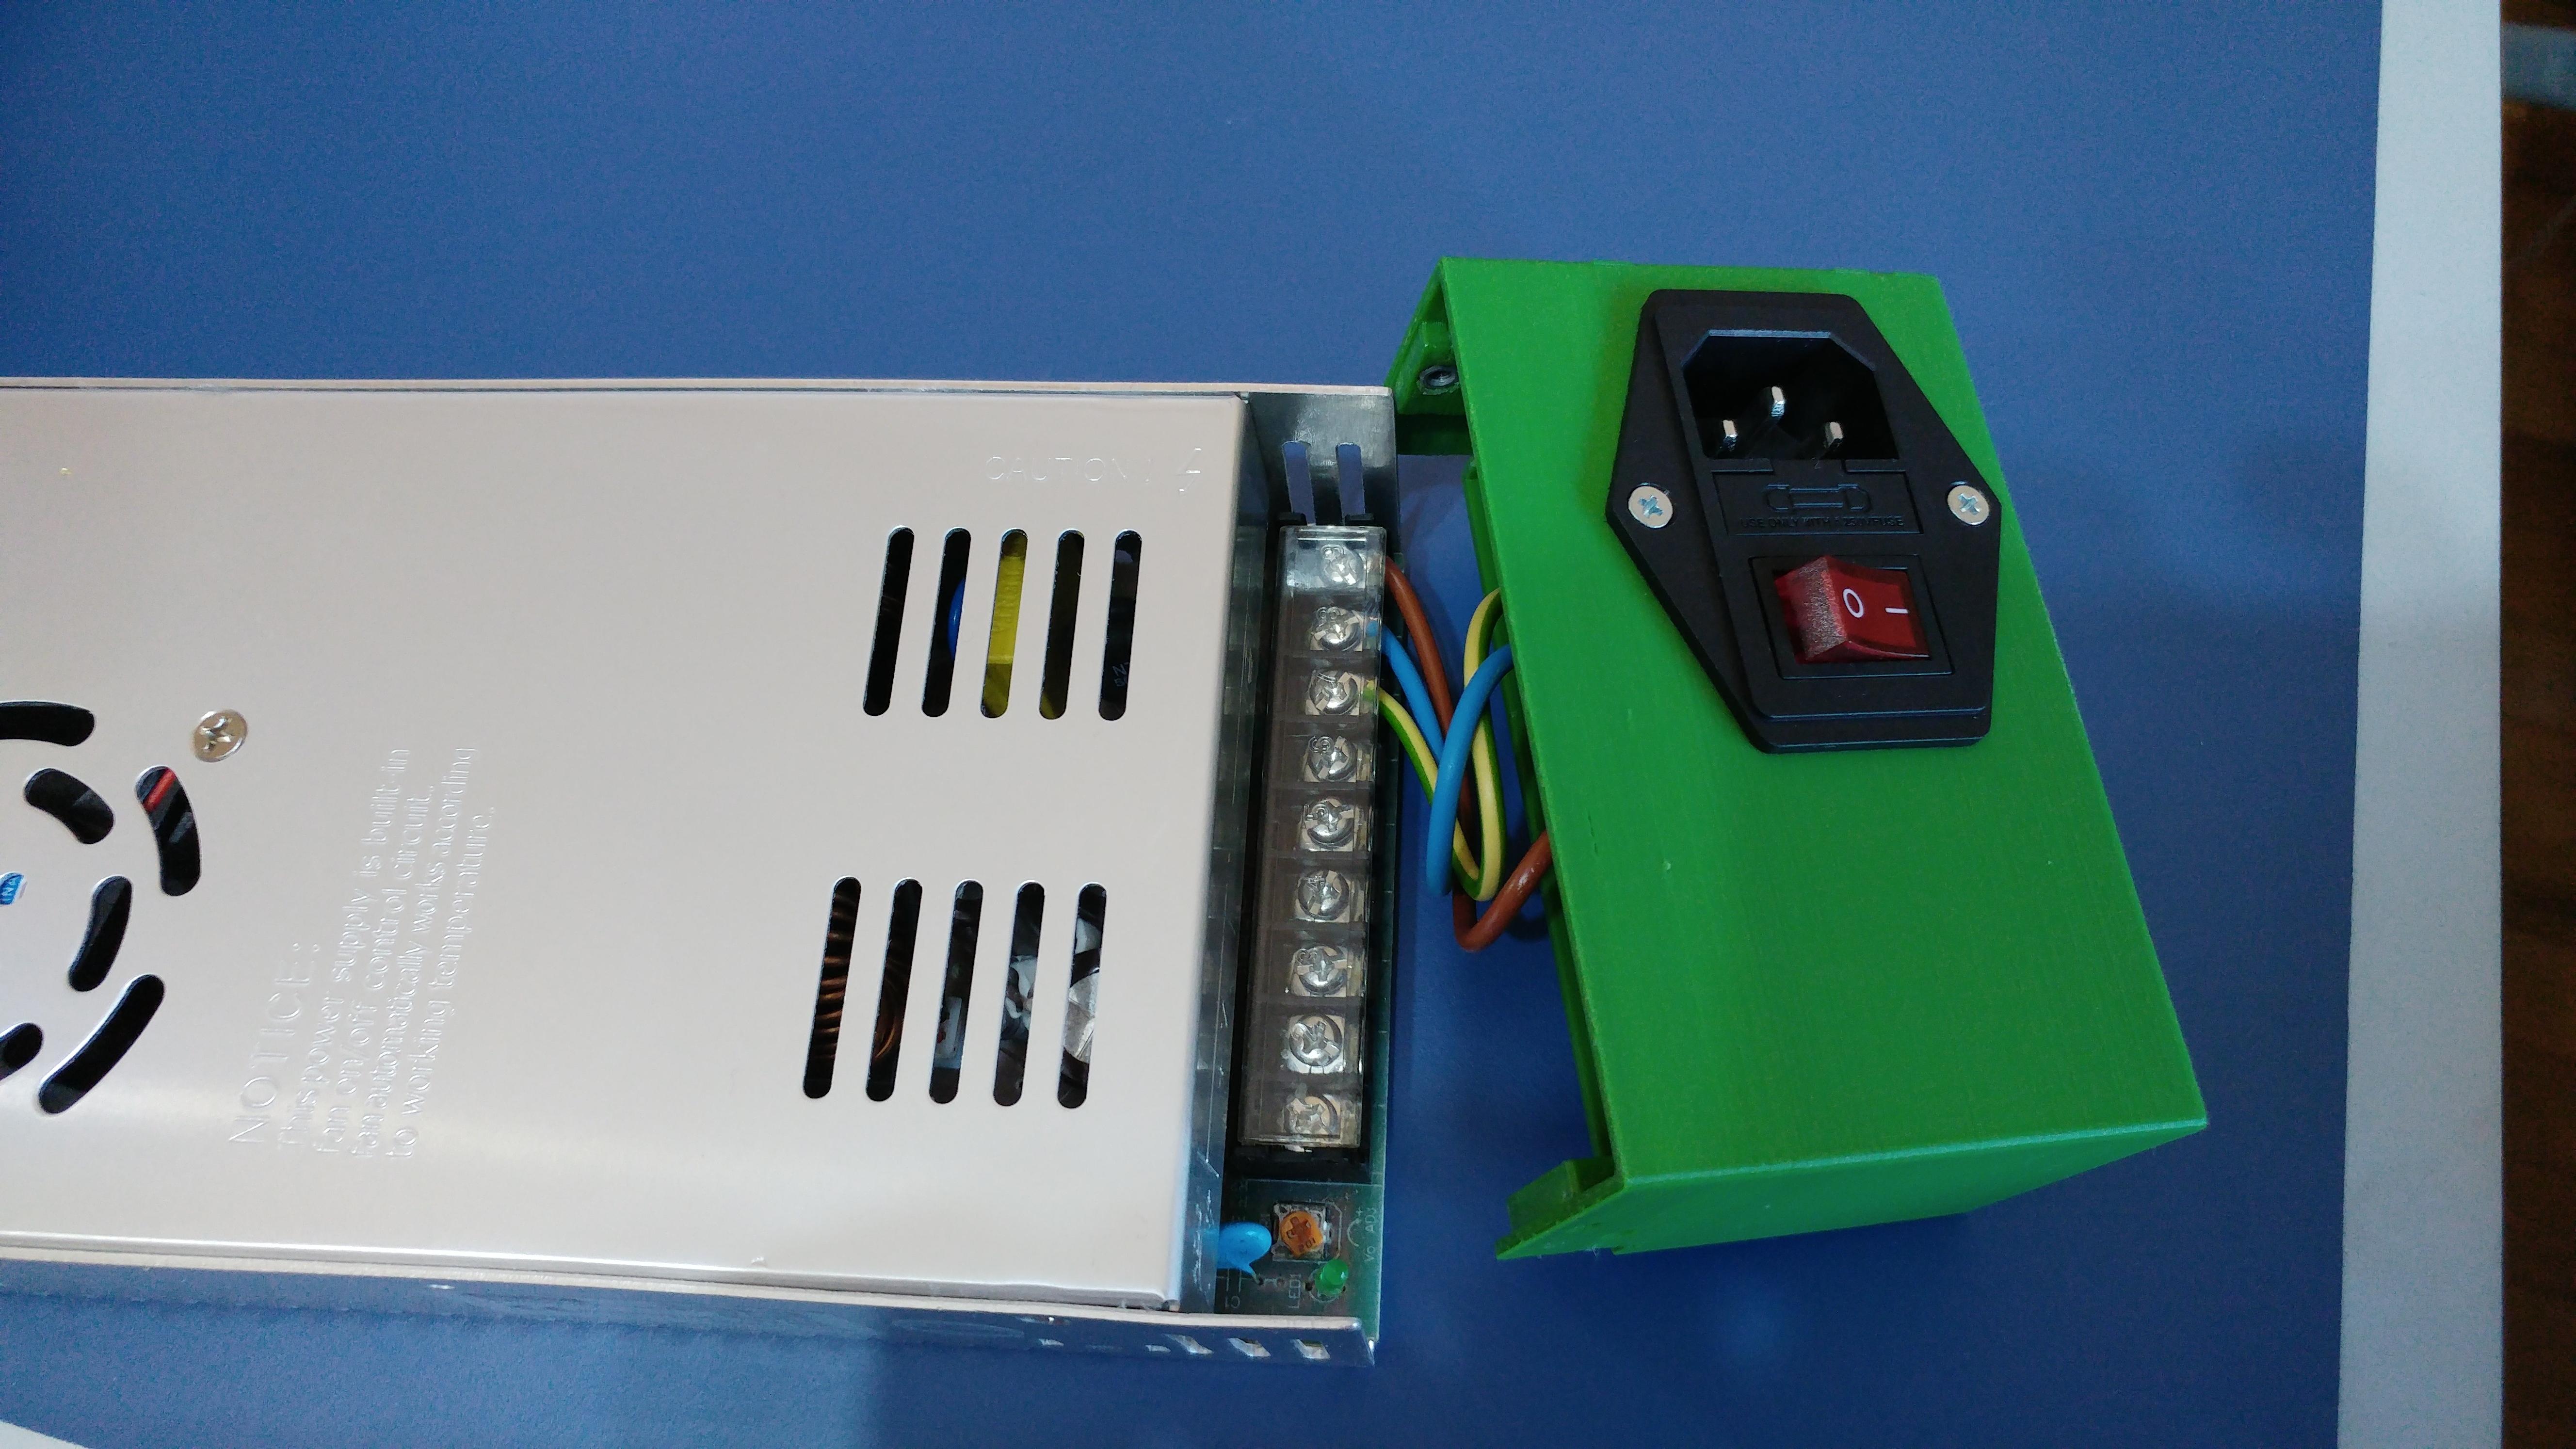 20190816_124551.jpg Télécharger fichier STL gratuit Carcasa Fuente de Alimentación con interruptor de encendido • Plan pour imprimante 3D, celtarra12